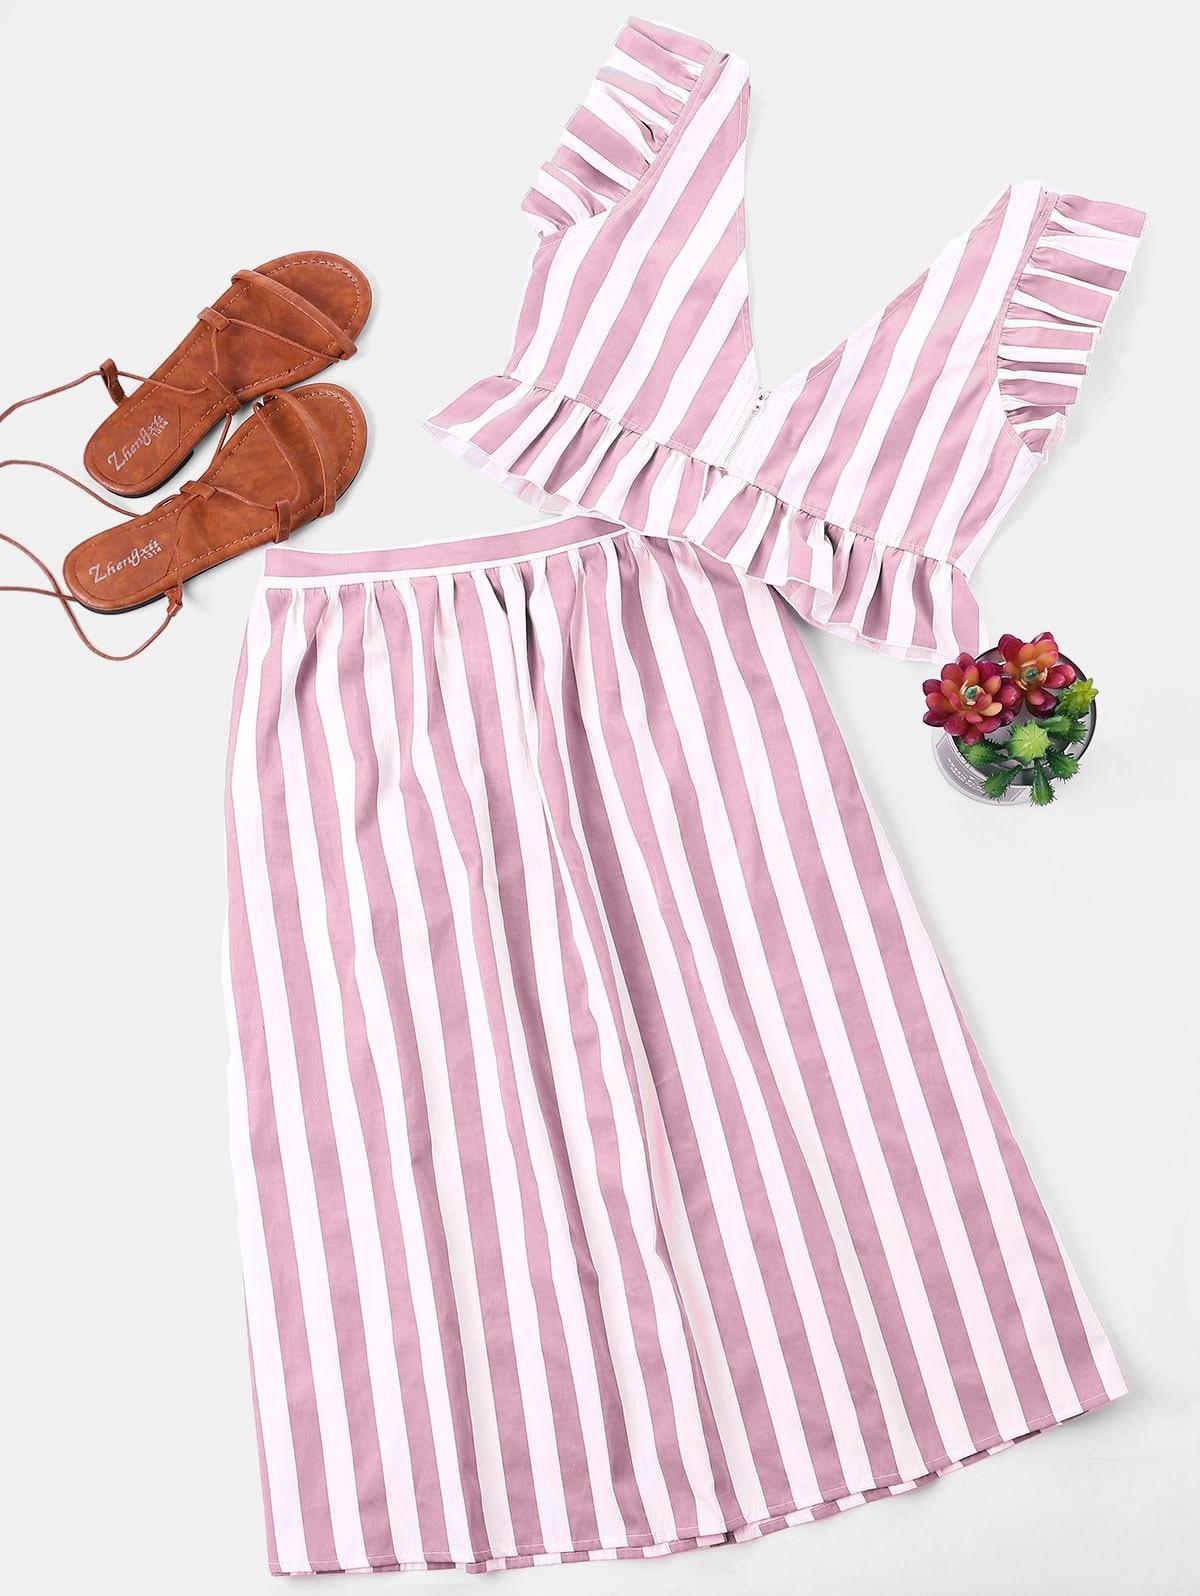 Two Piece Set Summer Women Sleeveless V Neck Crop Top Ruffle Button High Waist Skirts Striped Sets in Women 39 s Sets from Women 39 s Clothing